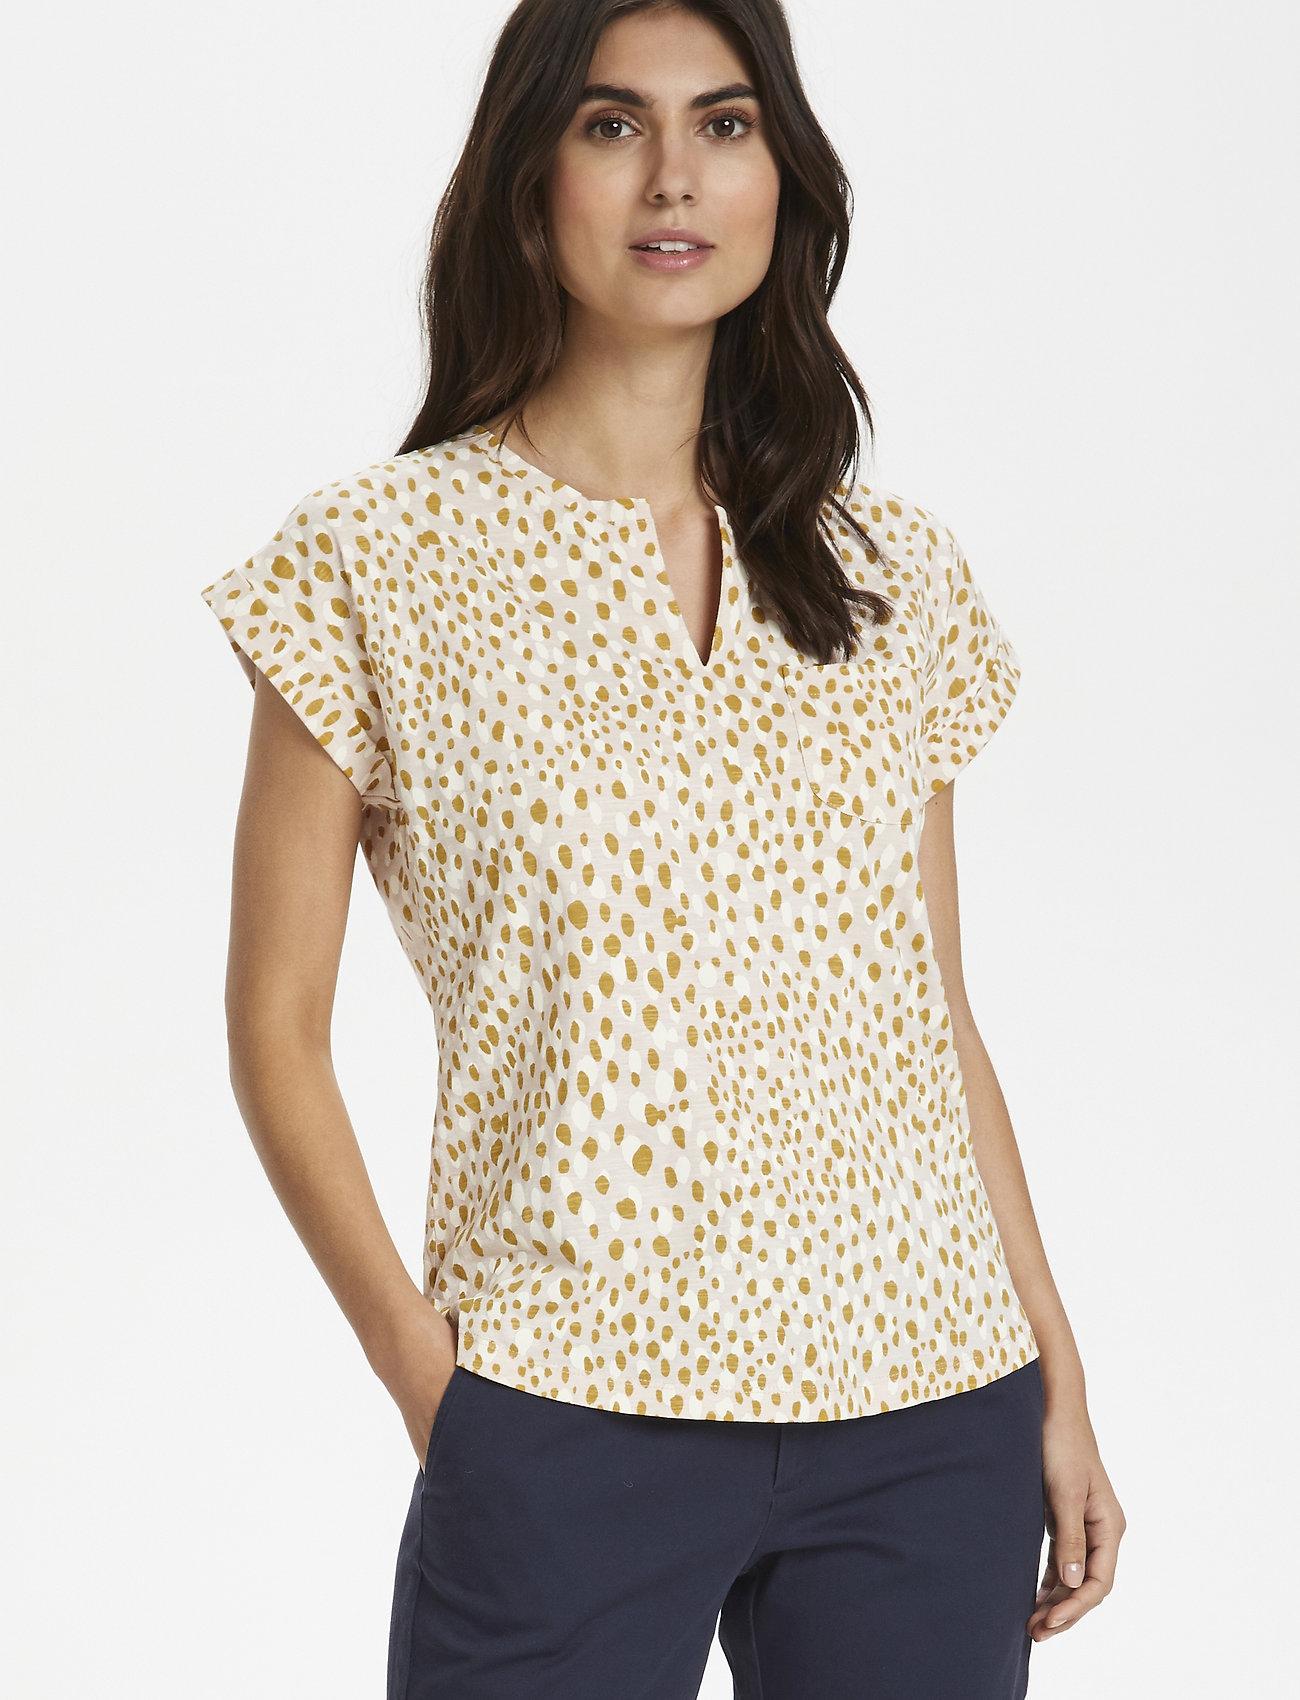 Part Two - KeditaPW TS - basic t-shirts - dot print, cream tan